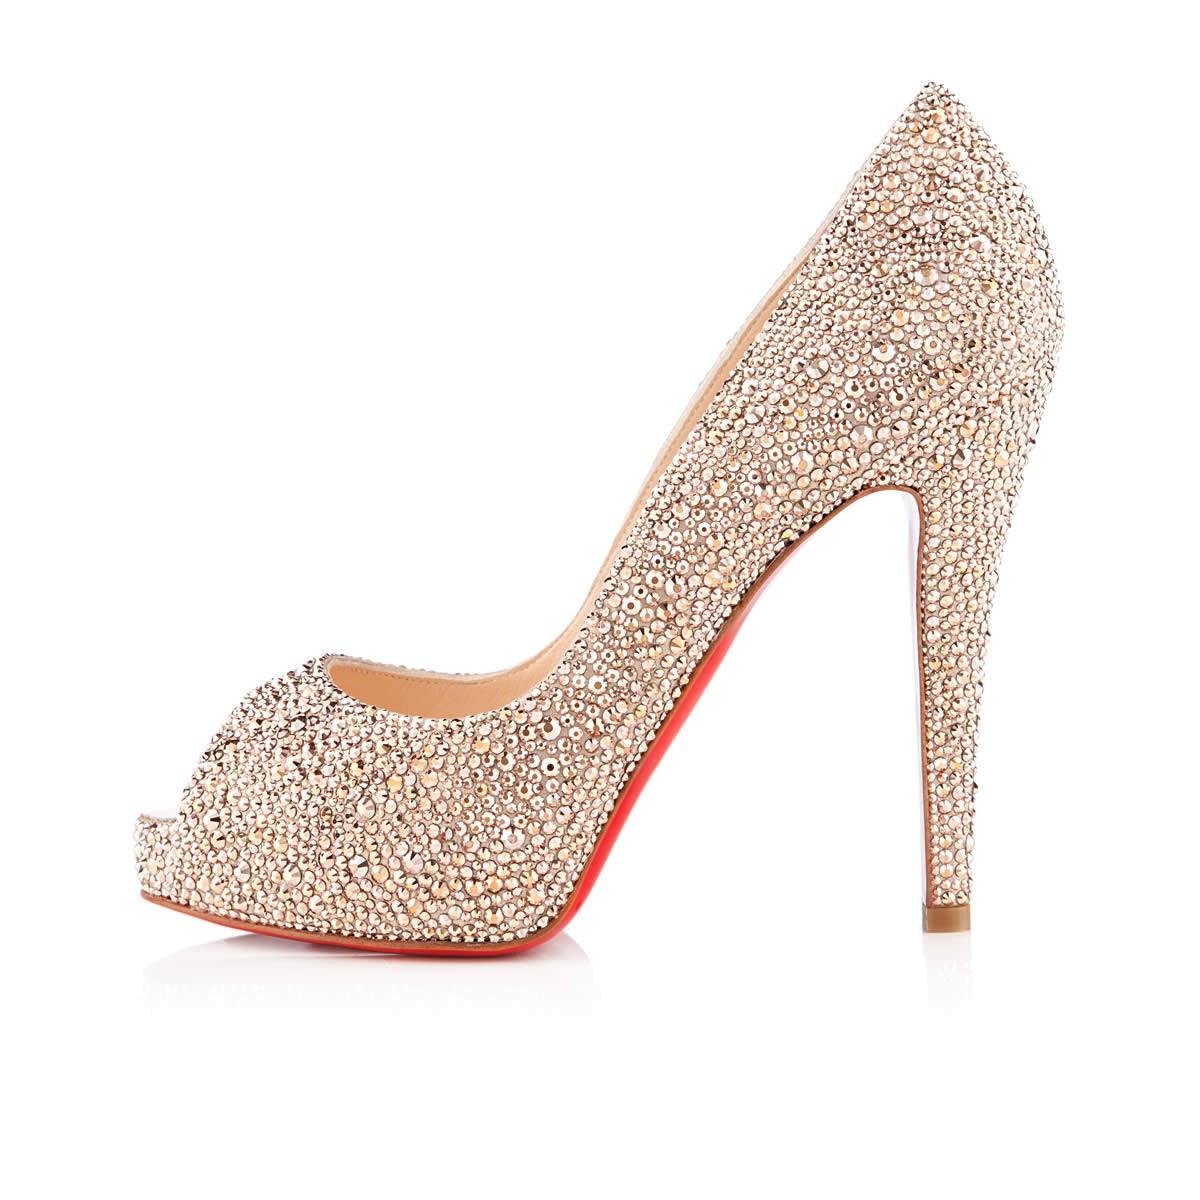 Pink Christian Louboutin Wedding Shoes